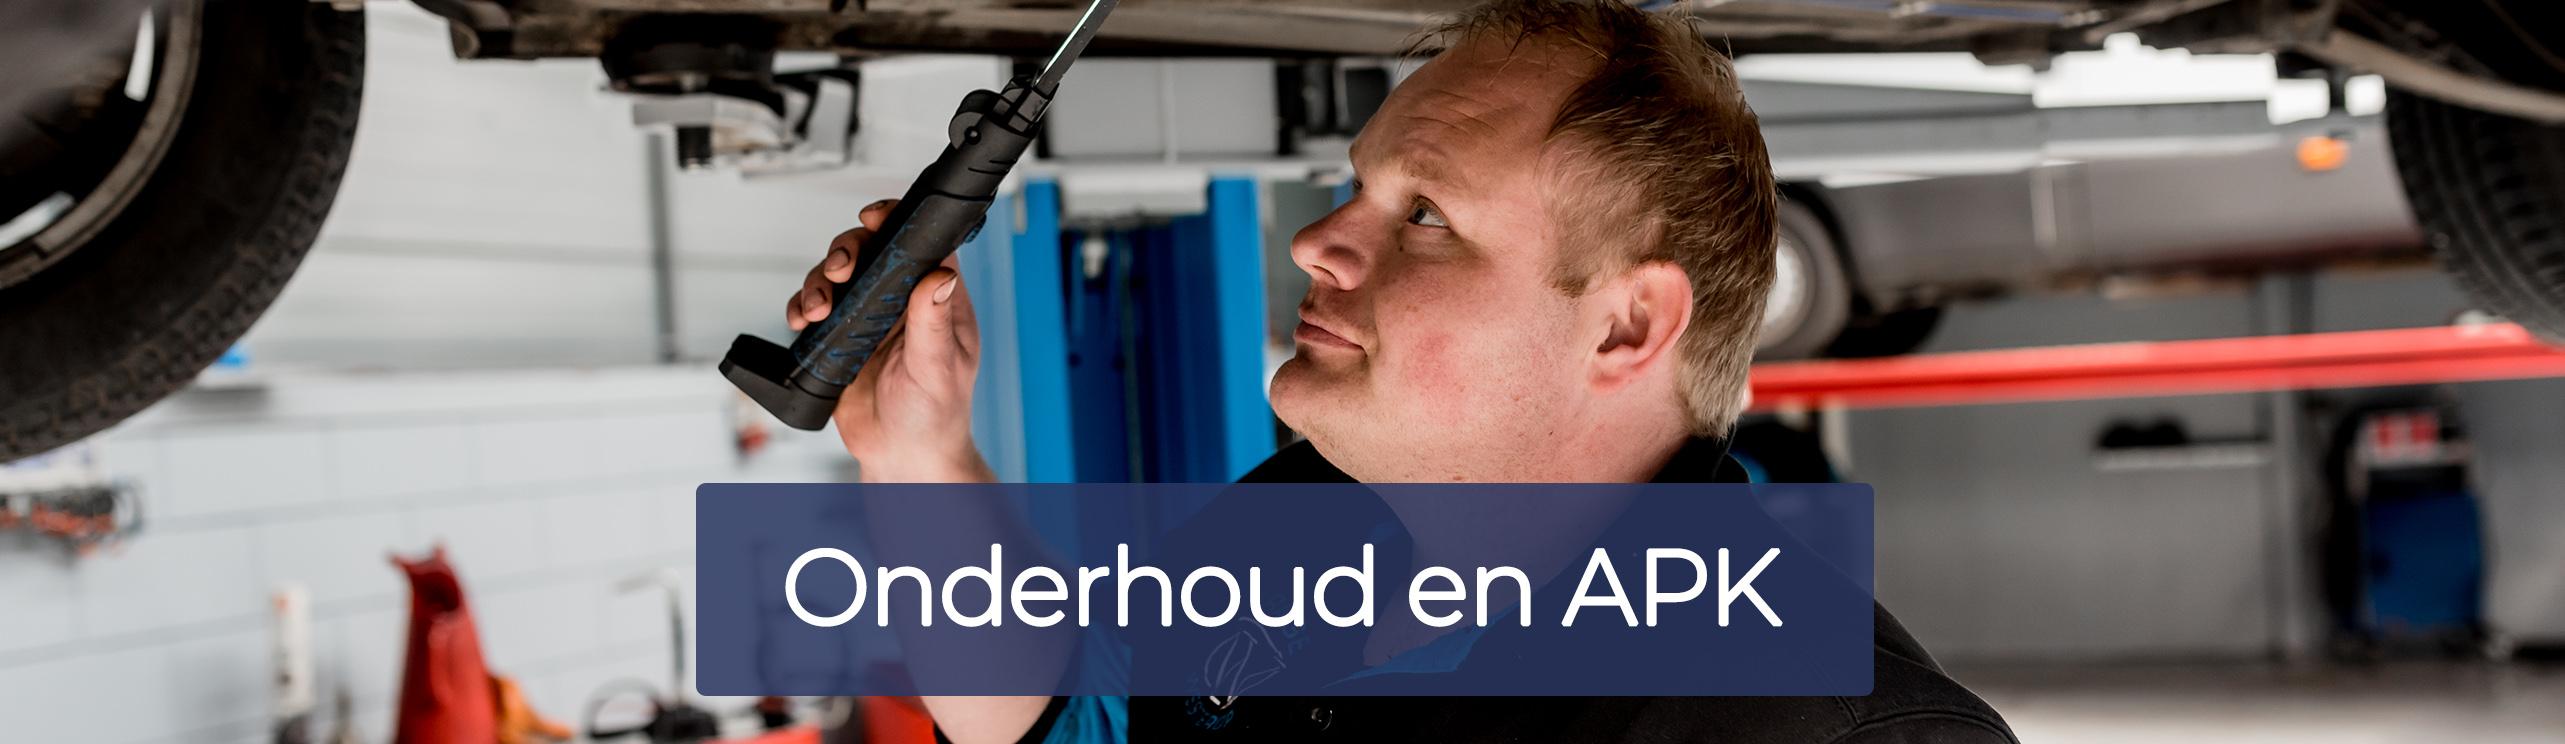 Onderhoud & APK Autocentrum Flevoland in Emmeloord